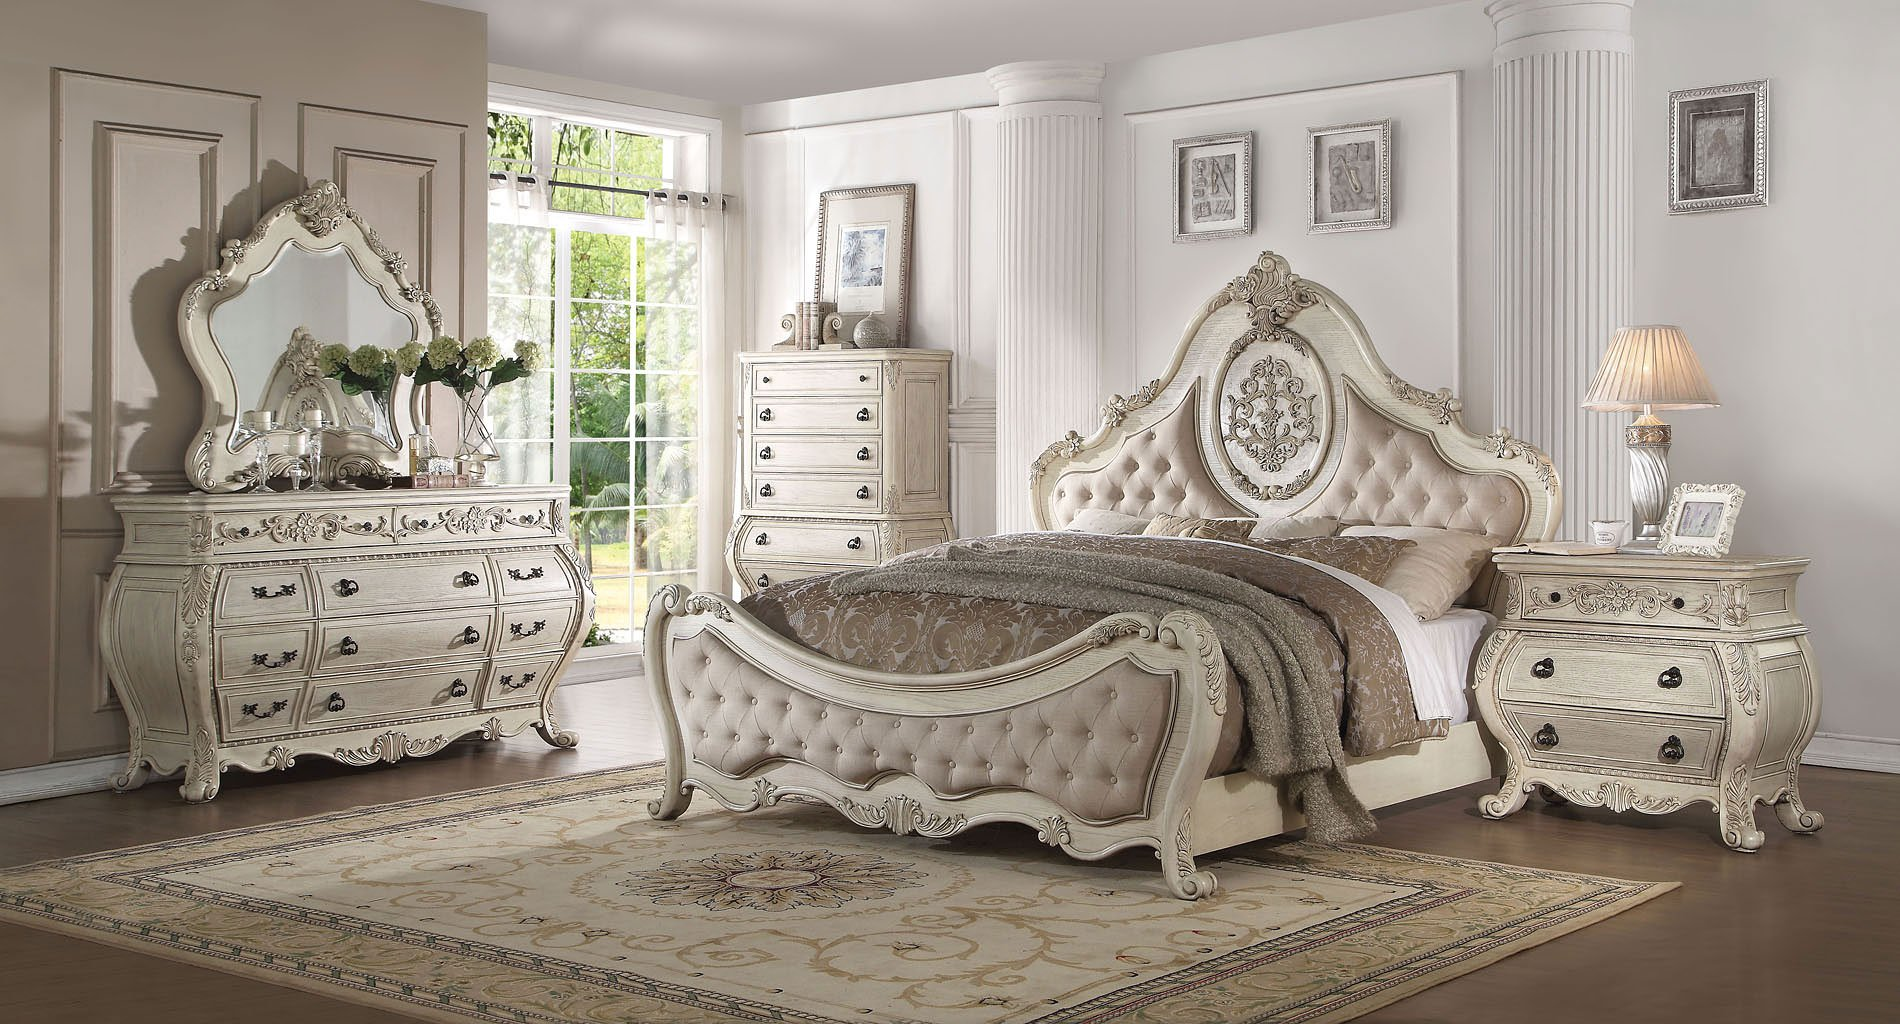 Ragenardus Panel Bedroom Set (Antique White)